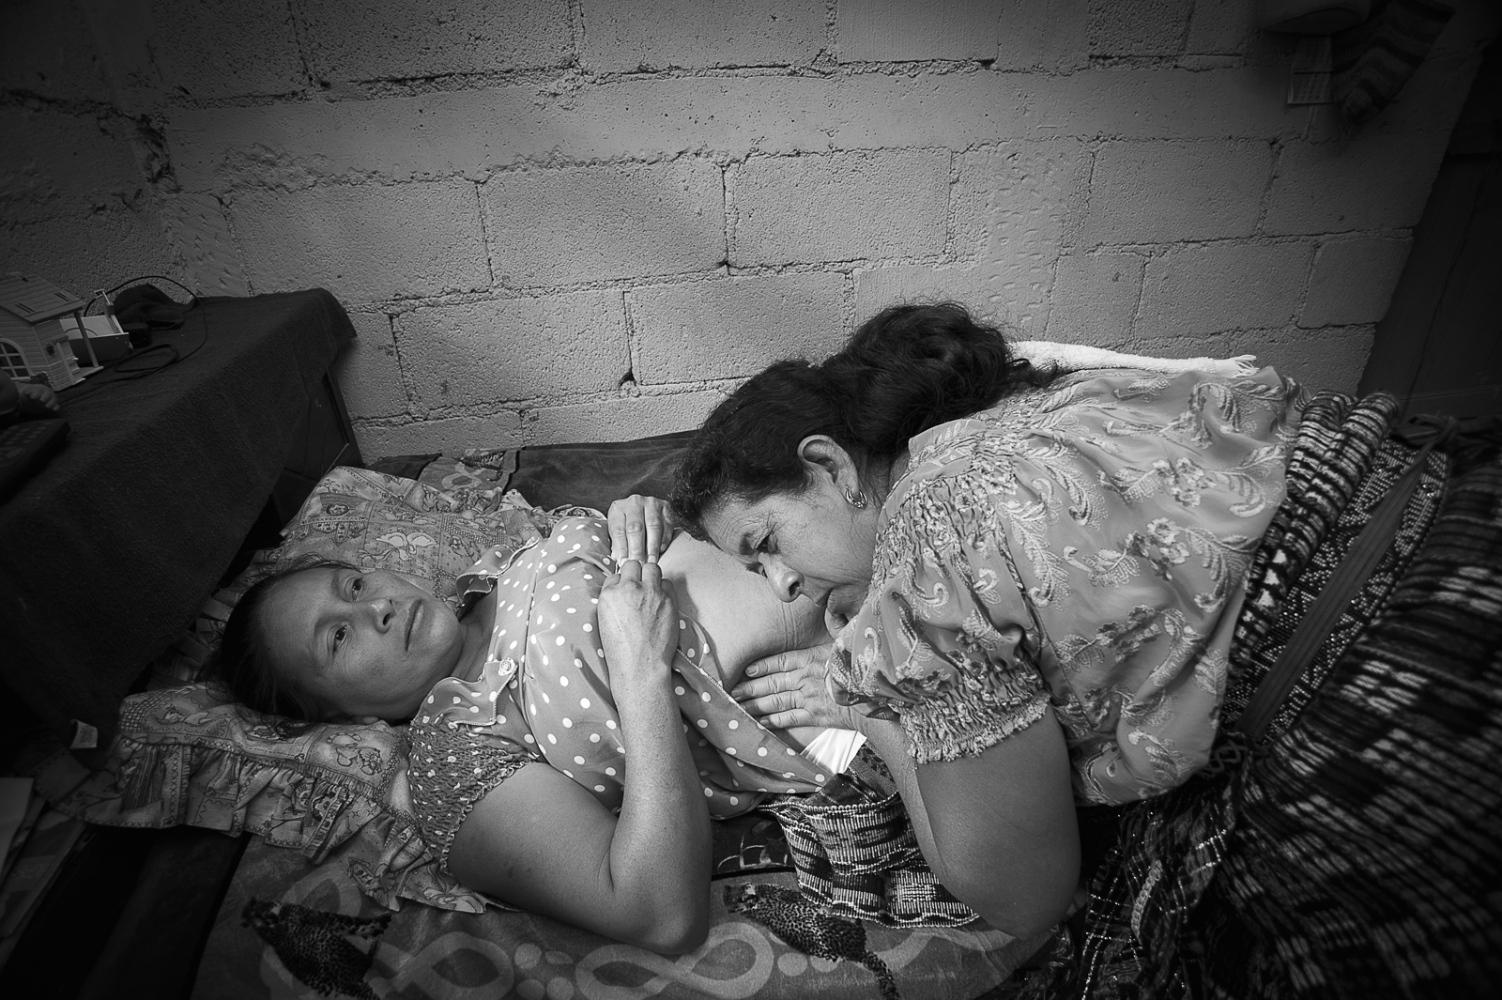 Healer Josefina Vazquez de Gonzalez examining a pregnant woman